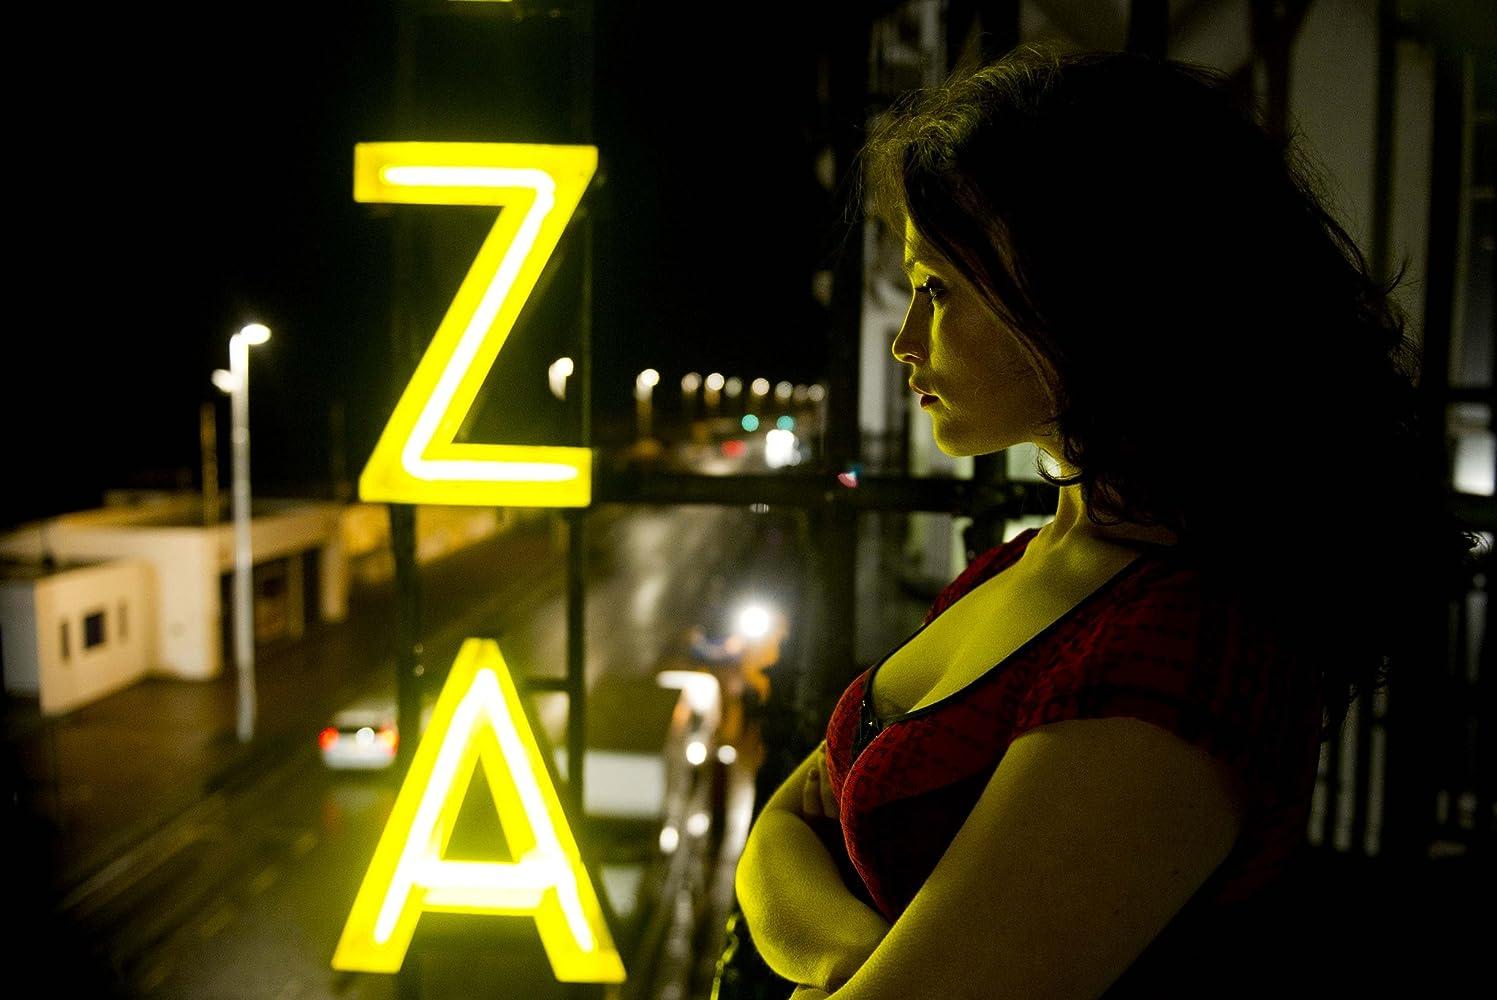 Gemma Arterton in Byzantium (2012)